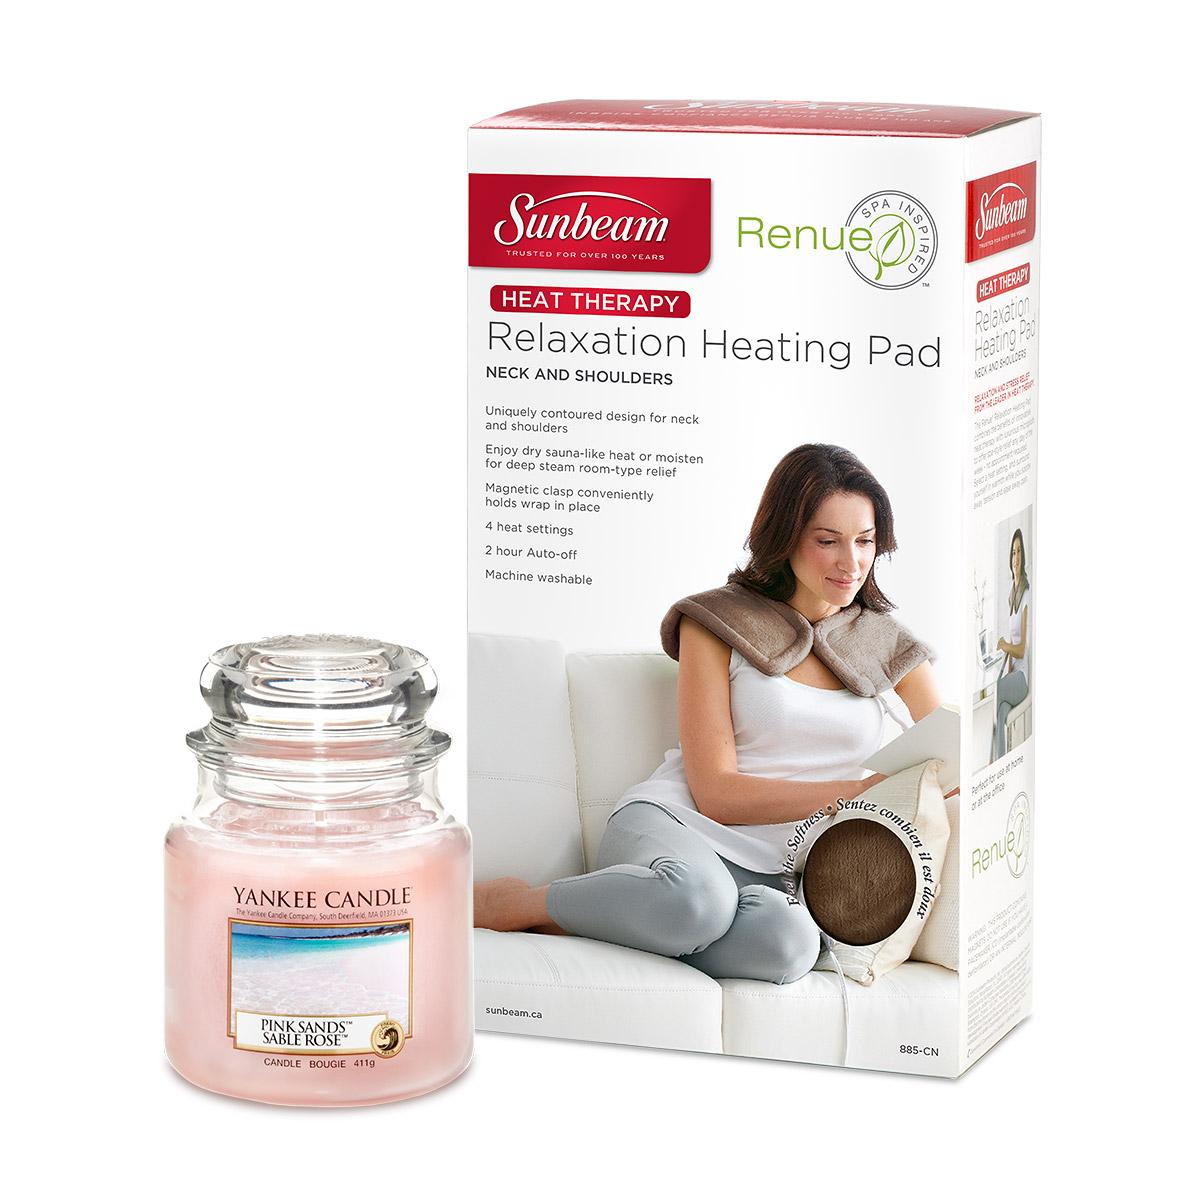 Extravagant Pink Sands™ Kit